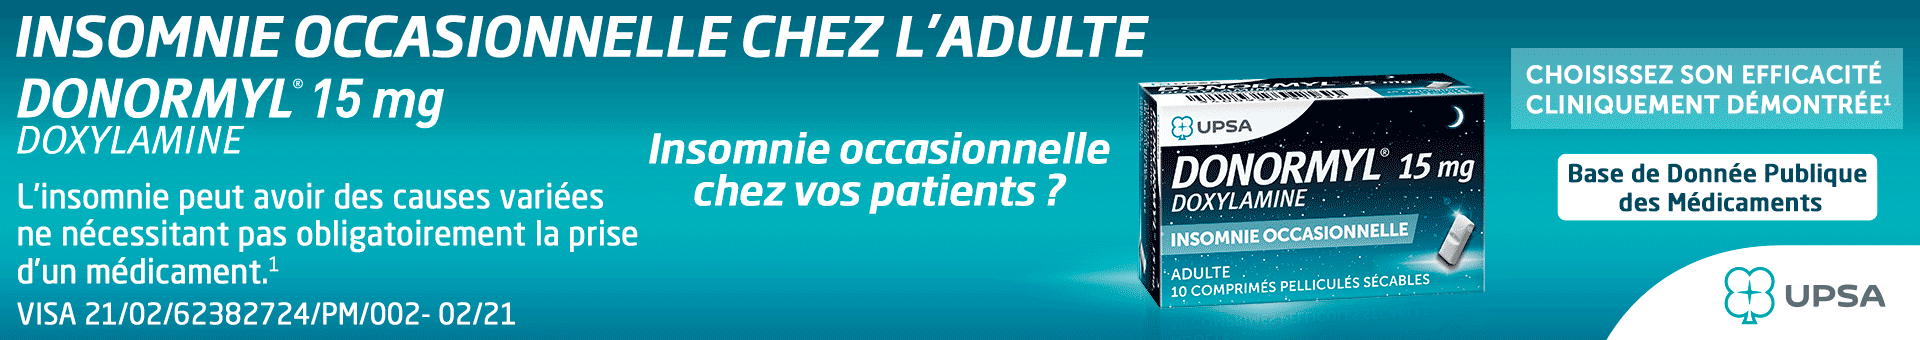 Pharmacie Du Pondaillan,SOUILLAC